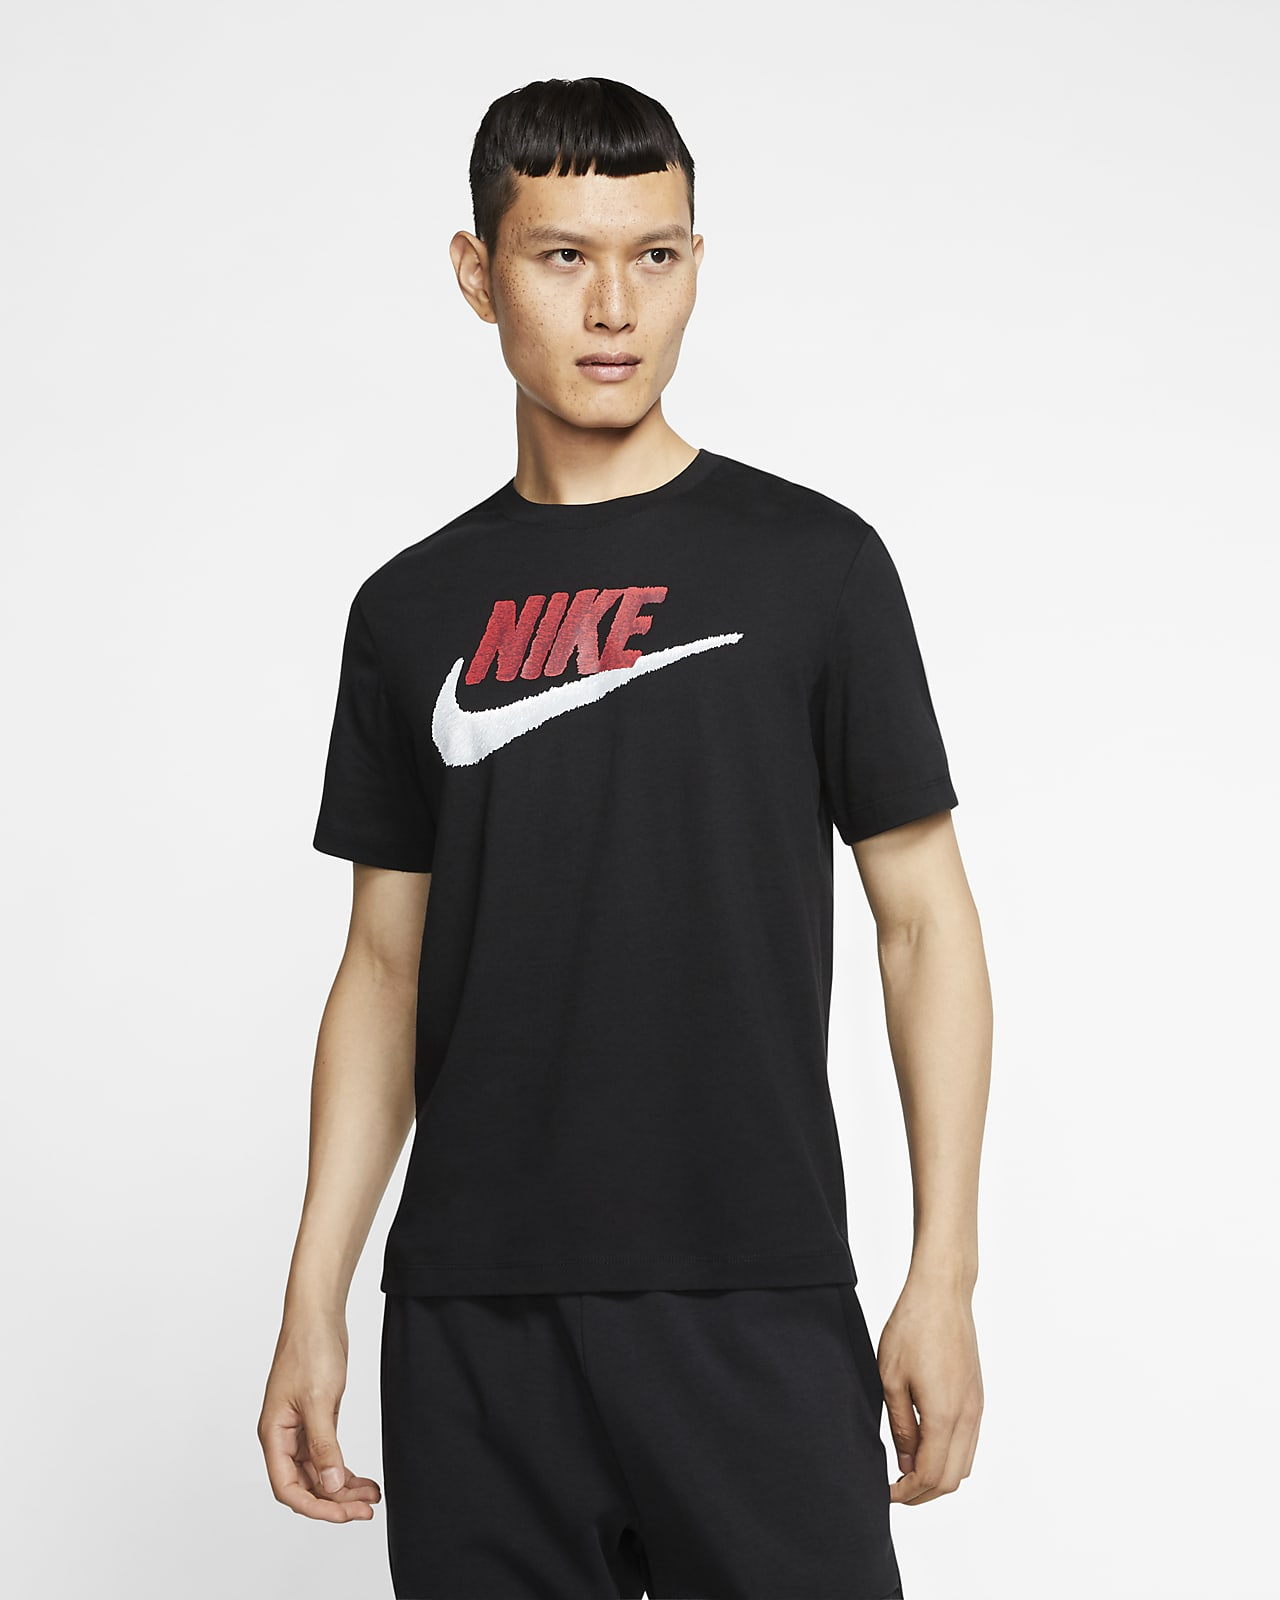 mercoledì Compassione Fondi  Nike Sportswear Men's T-Shirt. Nike.com